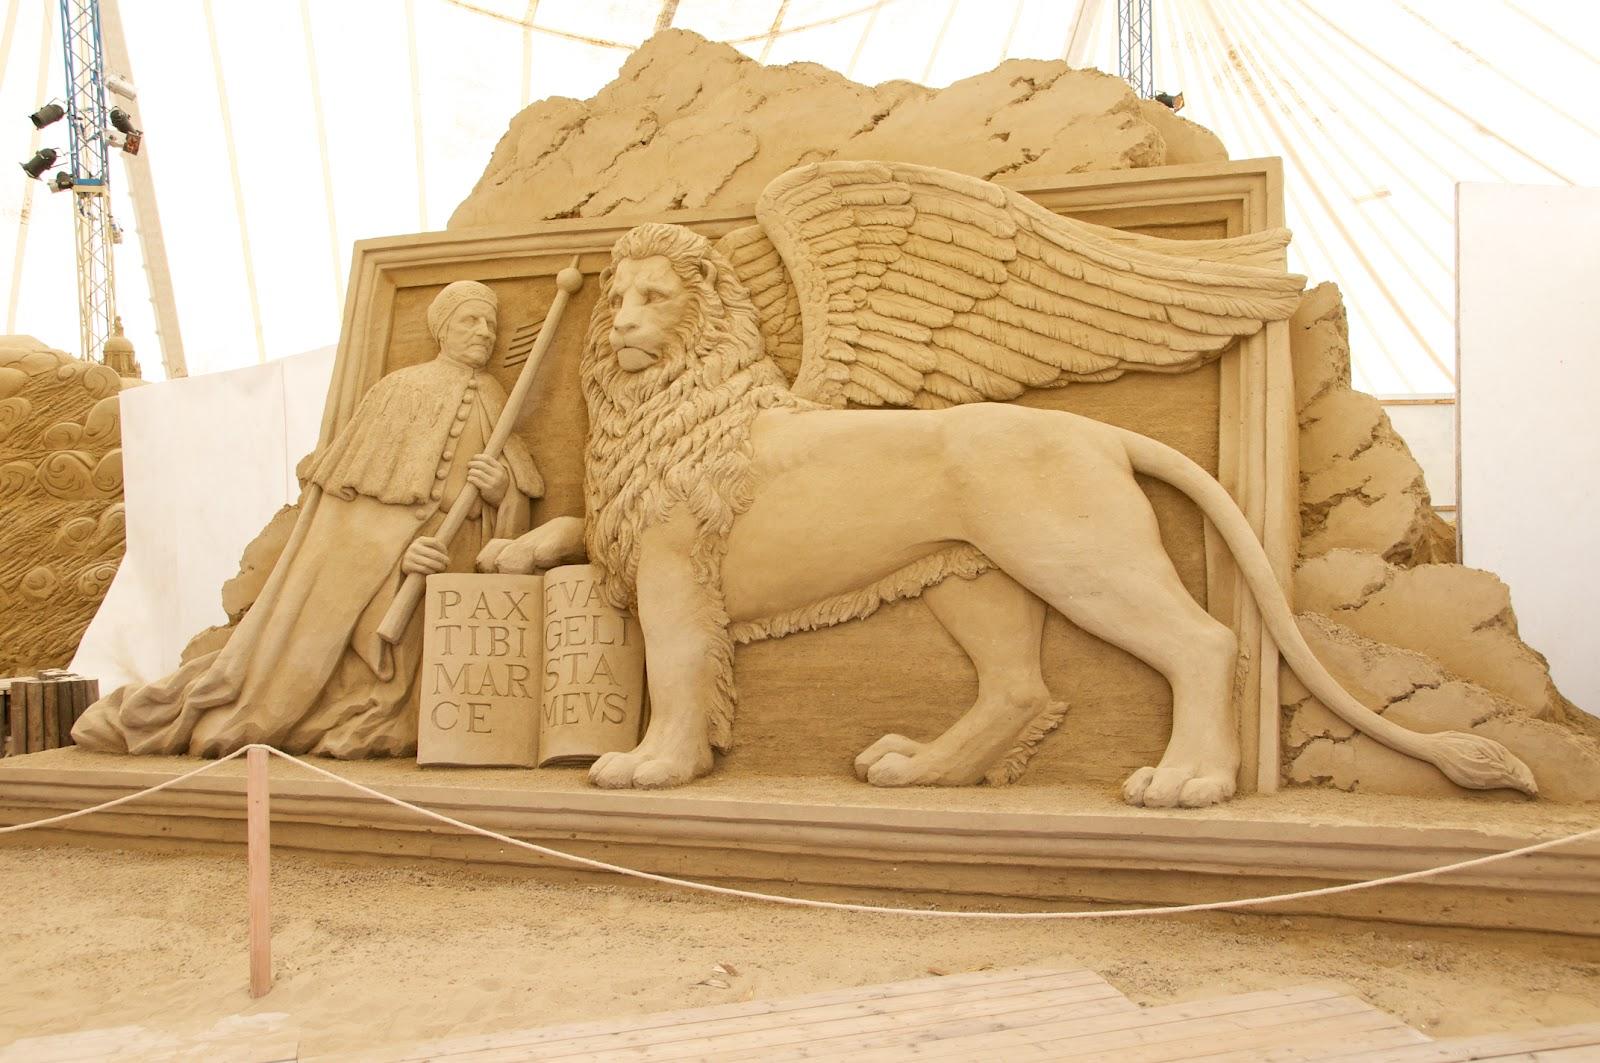 Jesolo Sand Sculpture Festival 2012 Venice  Photography to Love